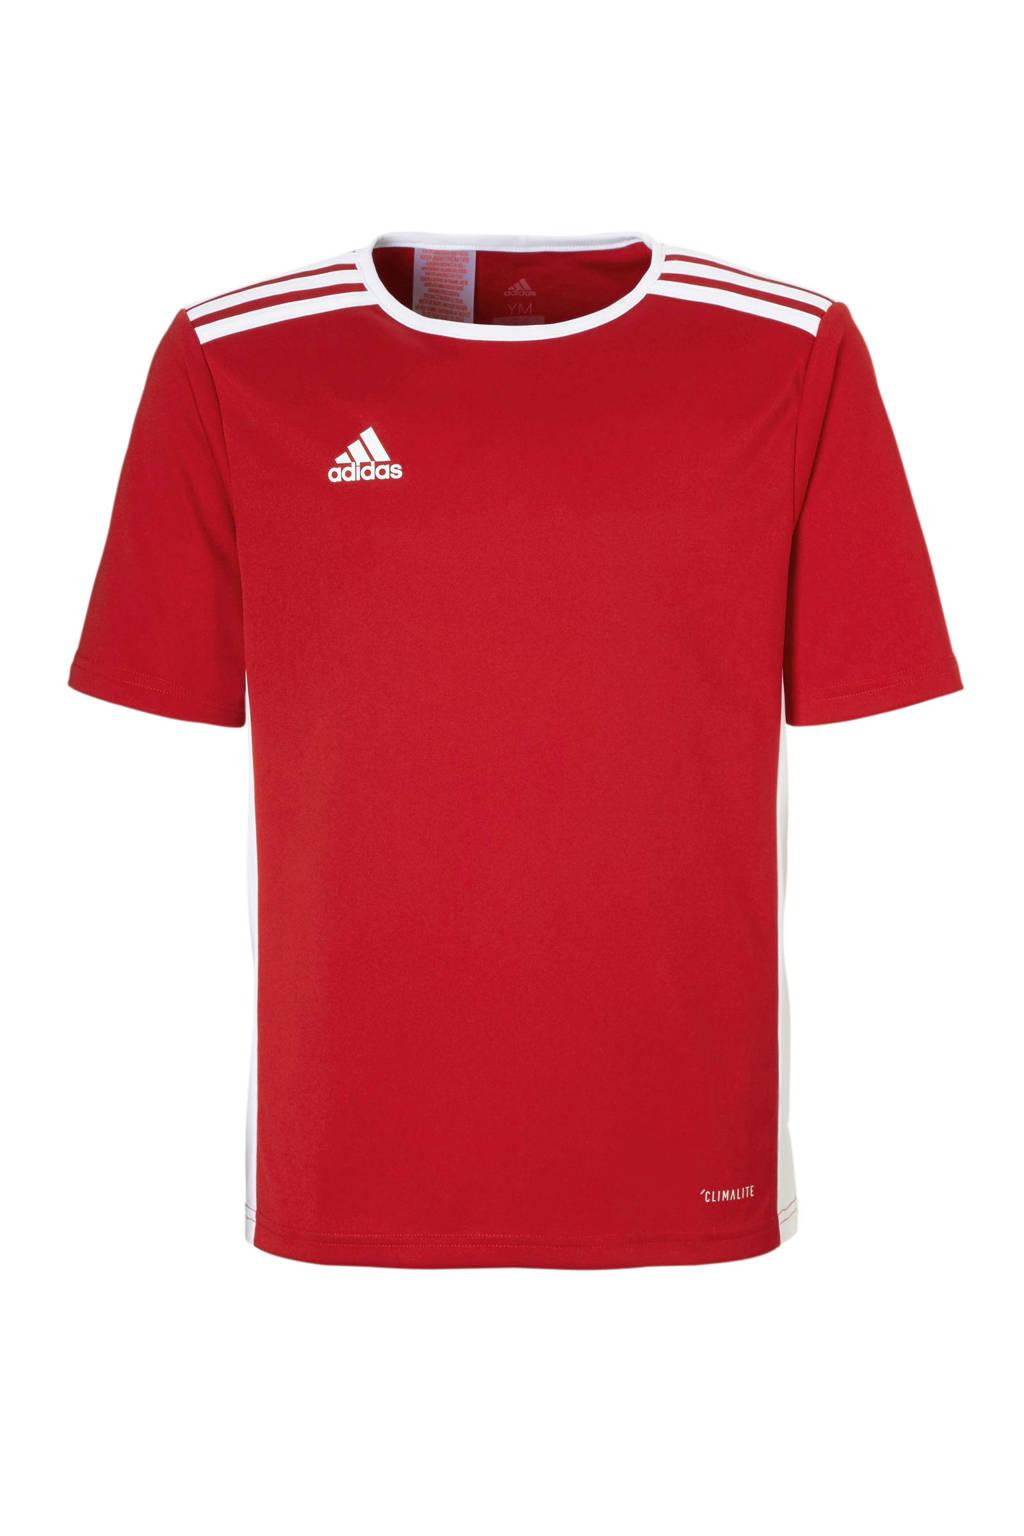 adidas Performance   sport T-shirt Entrada rood, Rood/wit, Jongens/meisjes